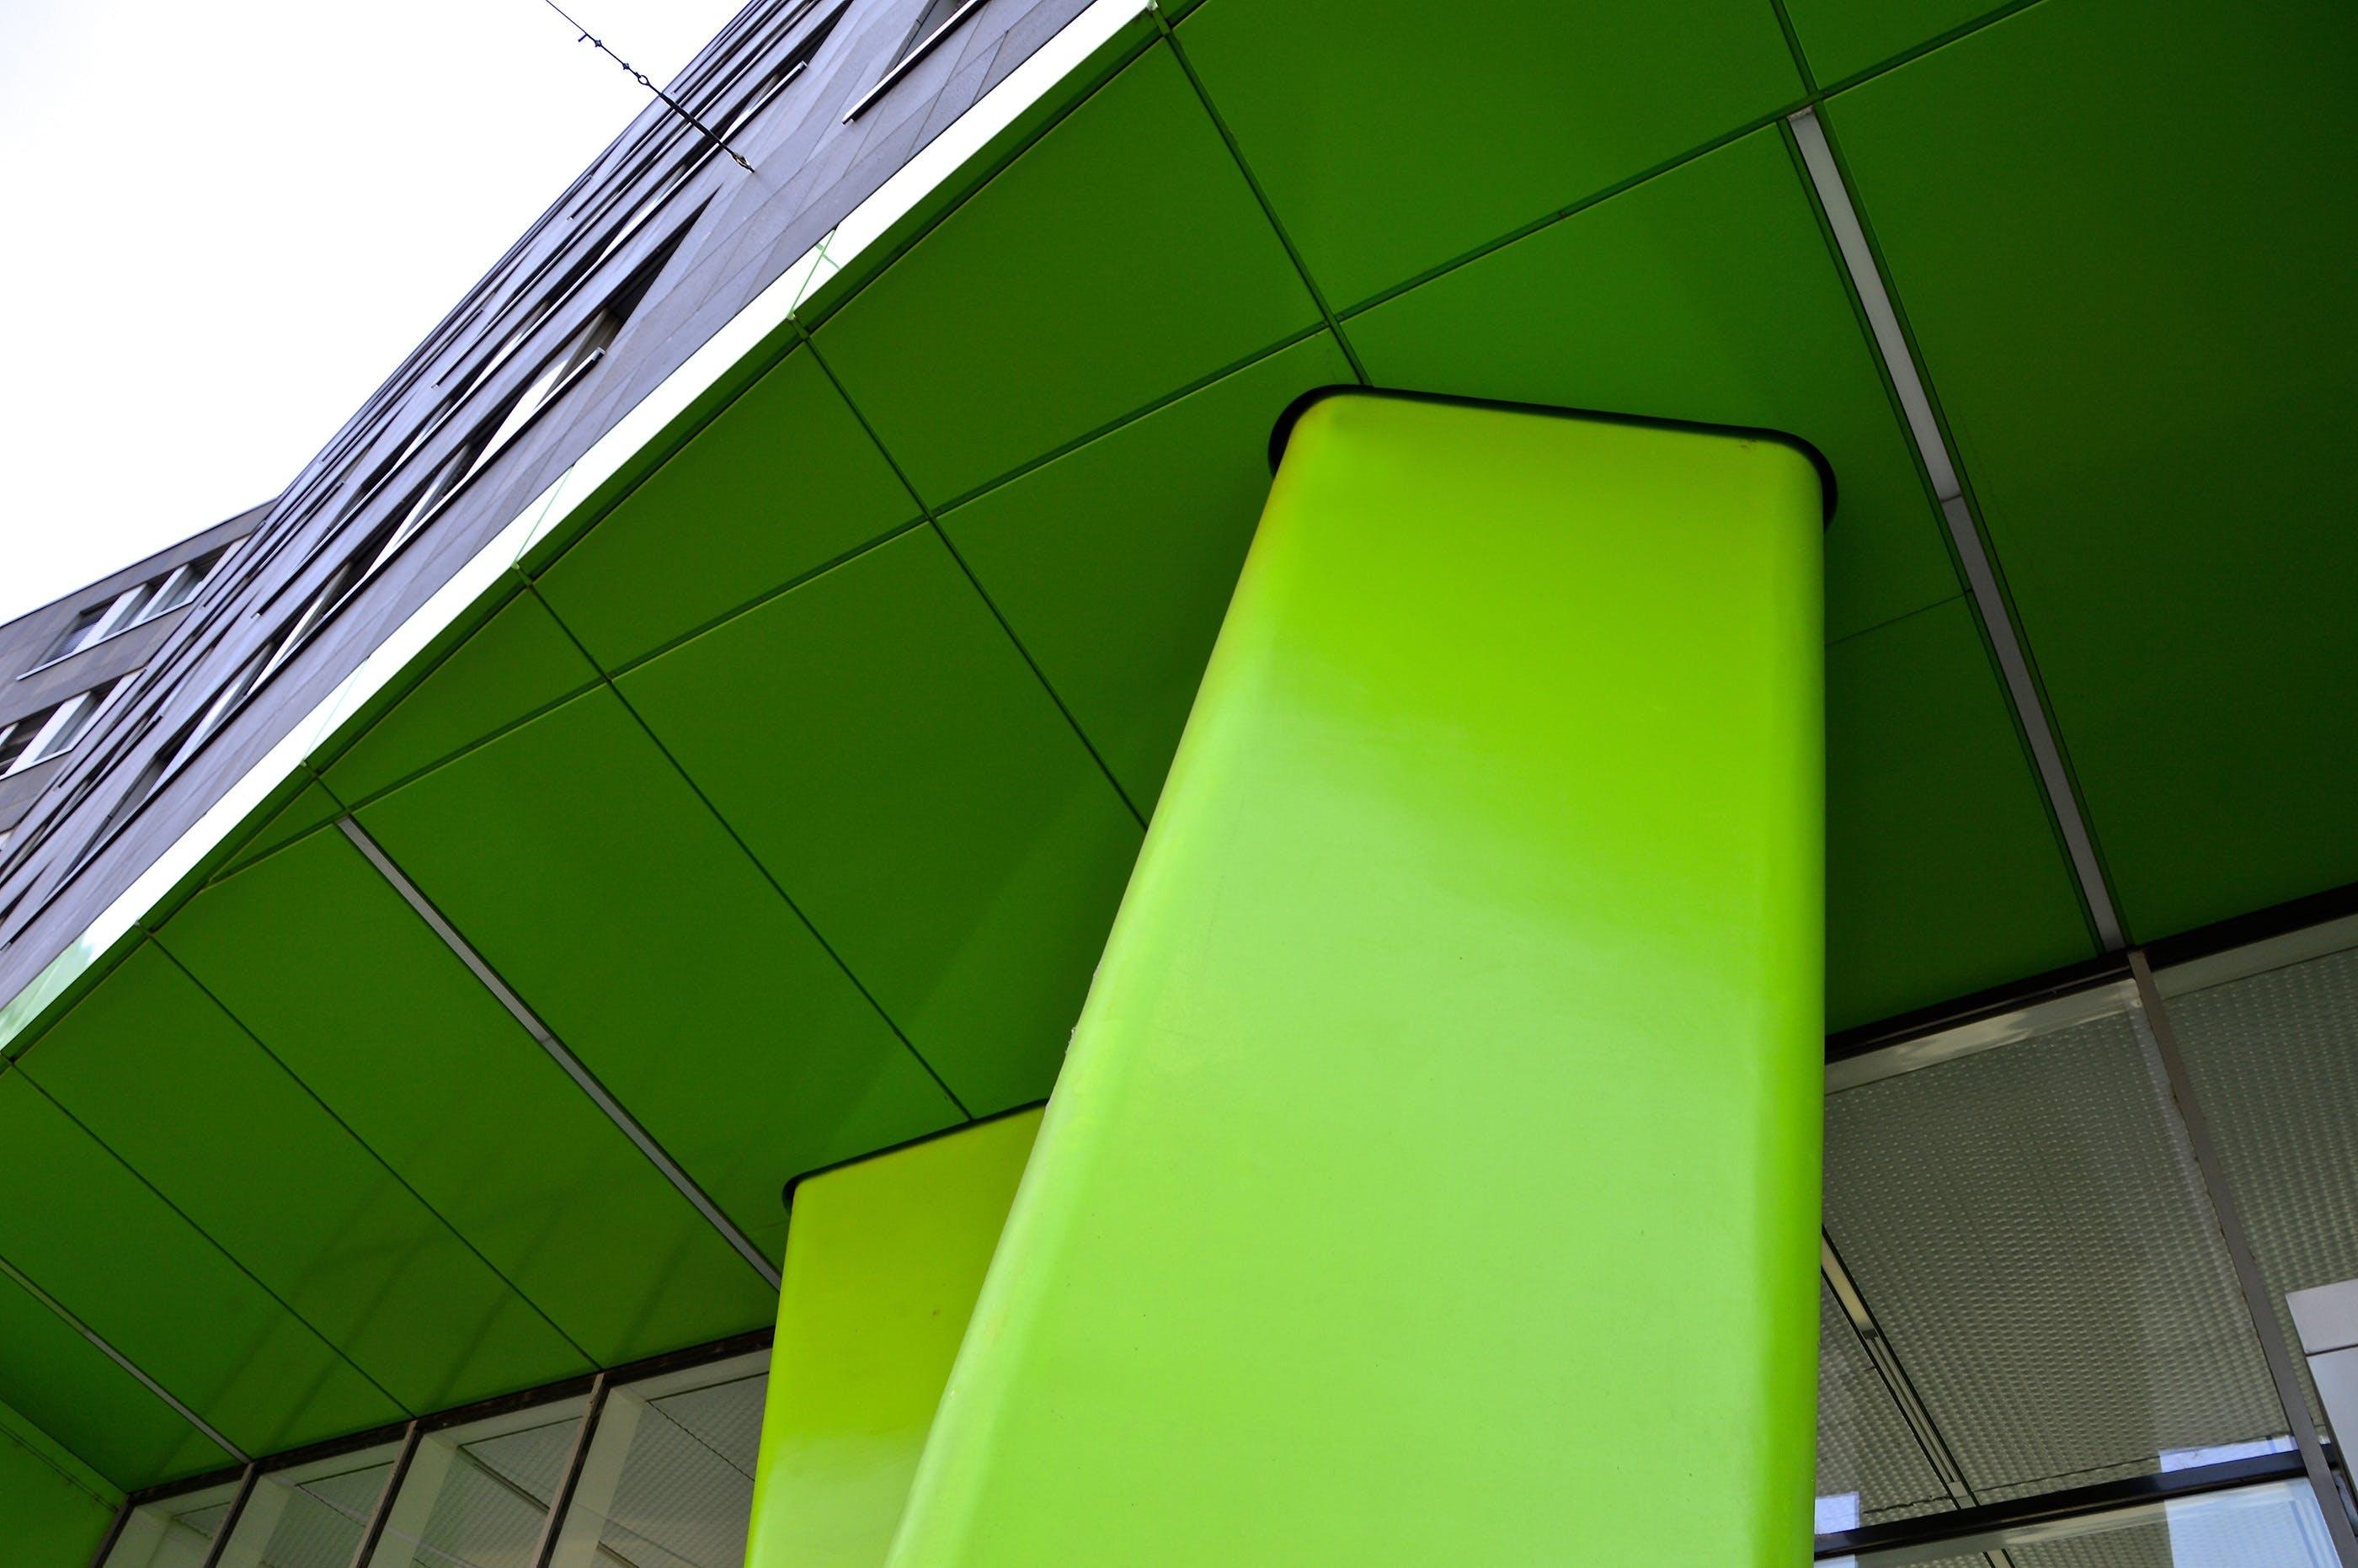 Closeup Photo of Green Bench